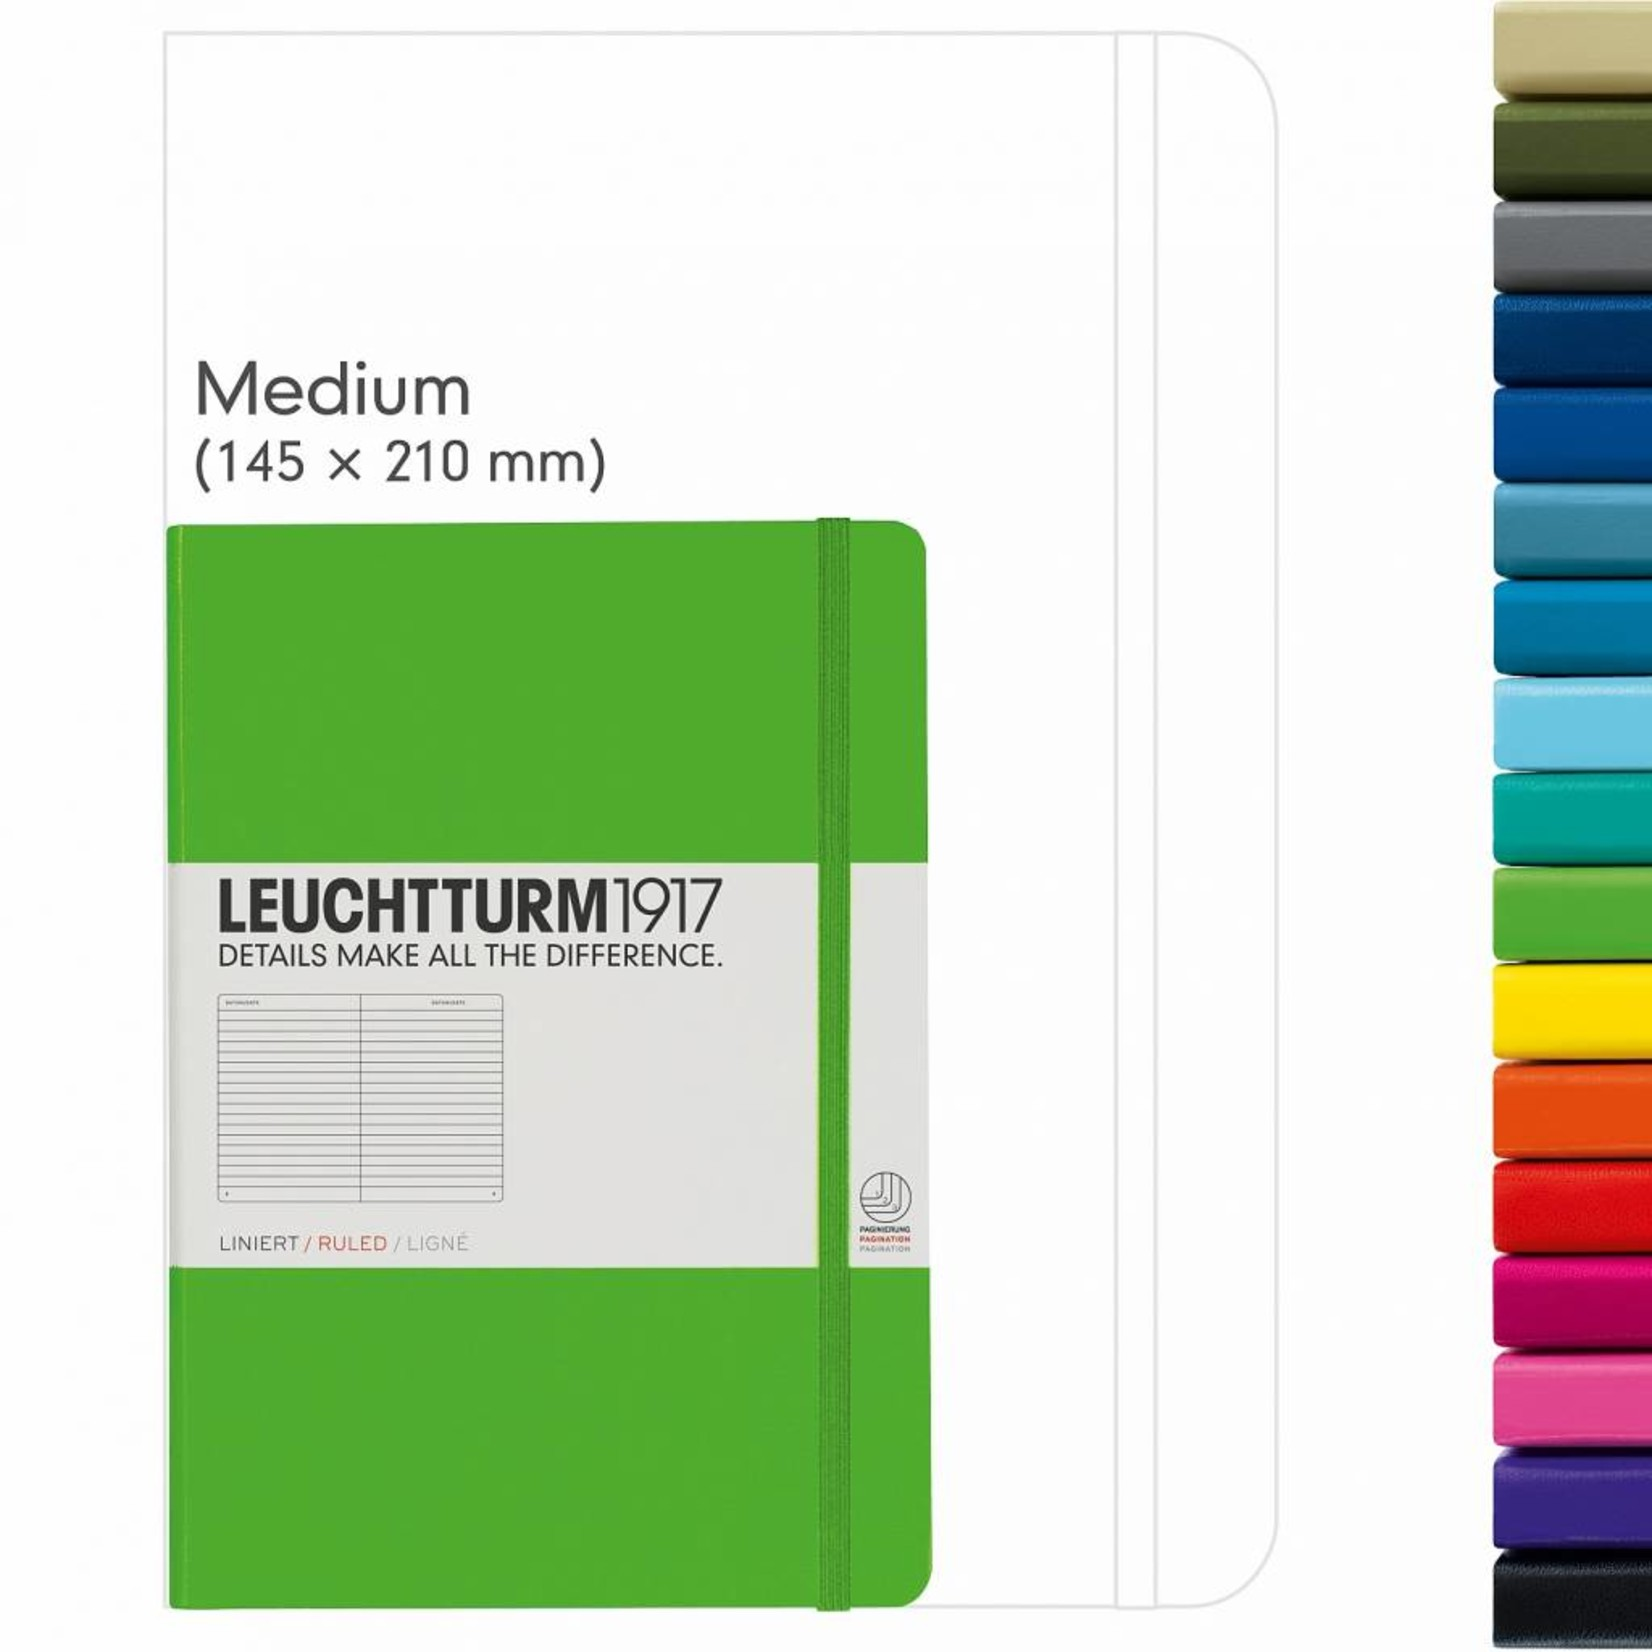 Leuchtturm1917 Leuchtturm1917 Notizbuch, Medium, Zitrone, Kariert